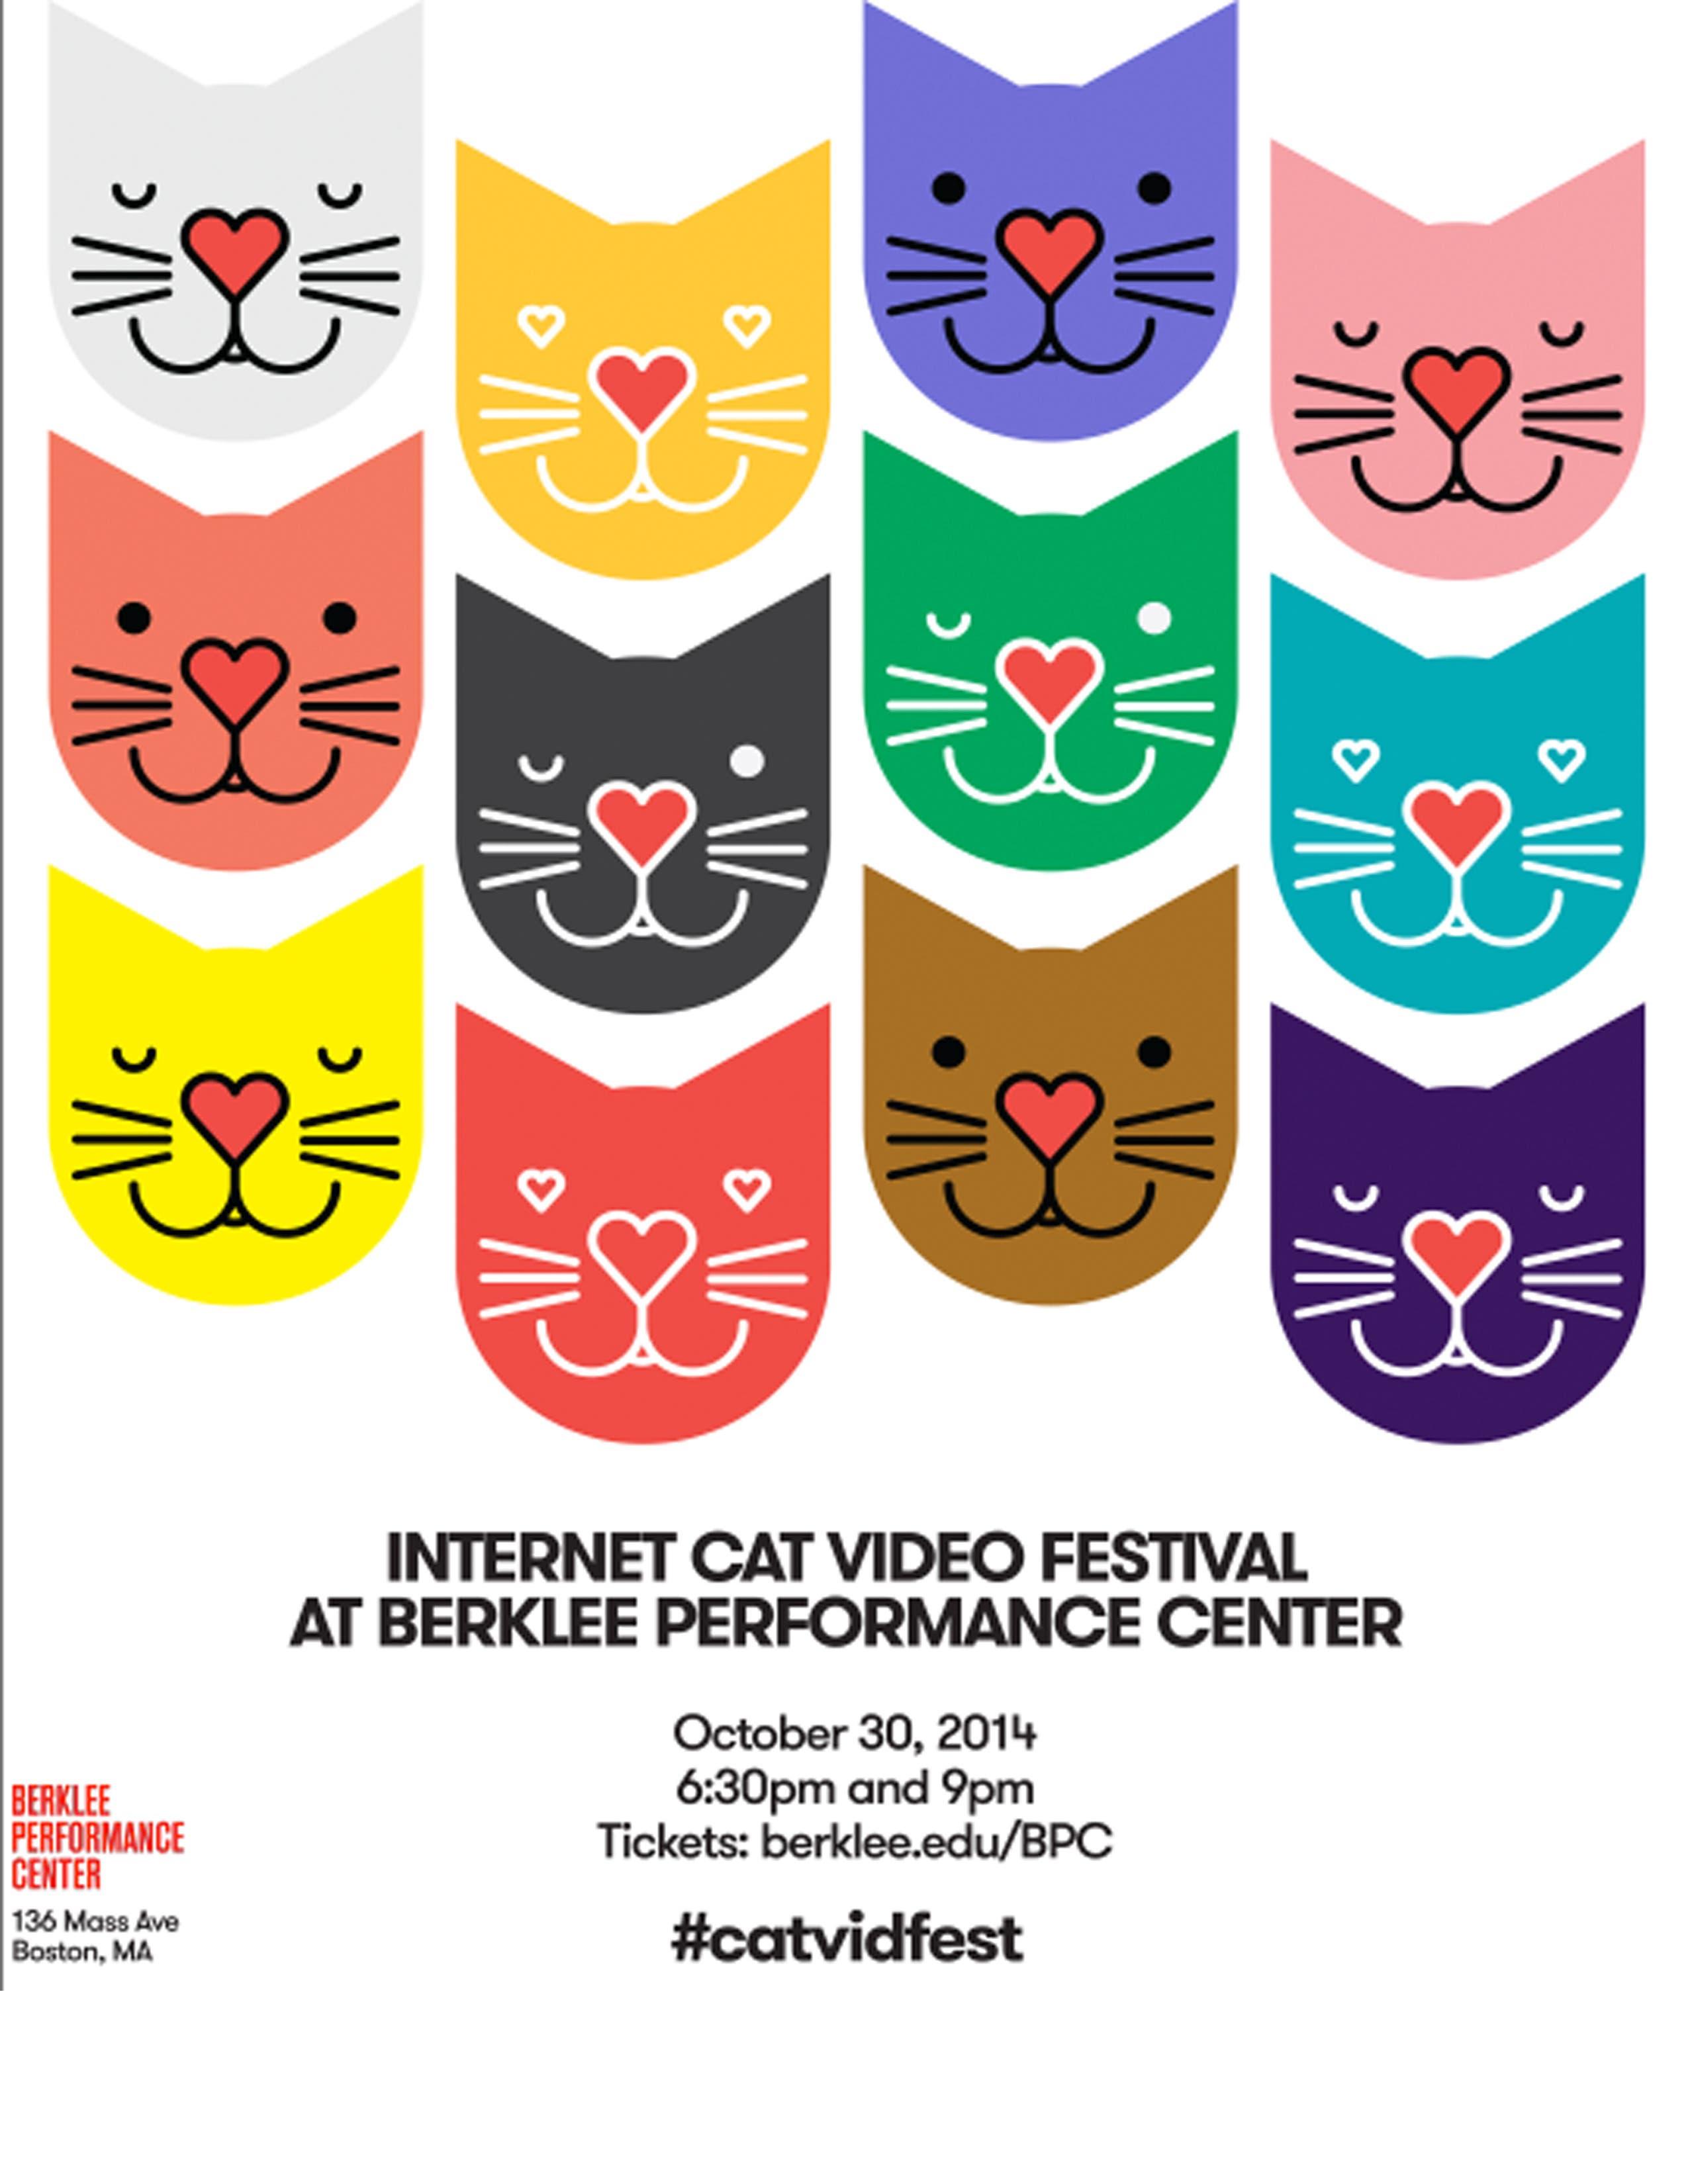 2014 Internet Cat Video Film Festival | Fenway, MA Patch